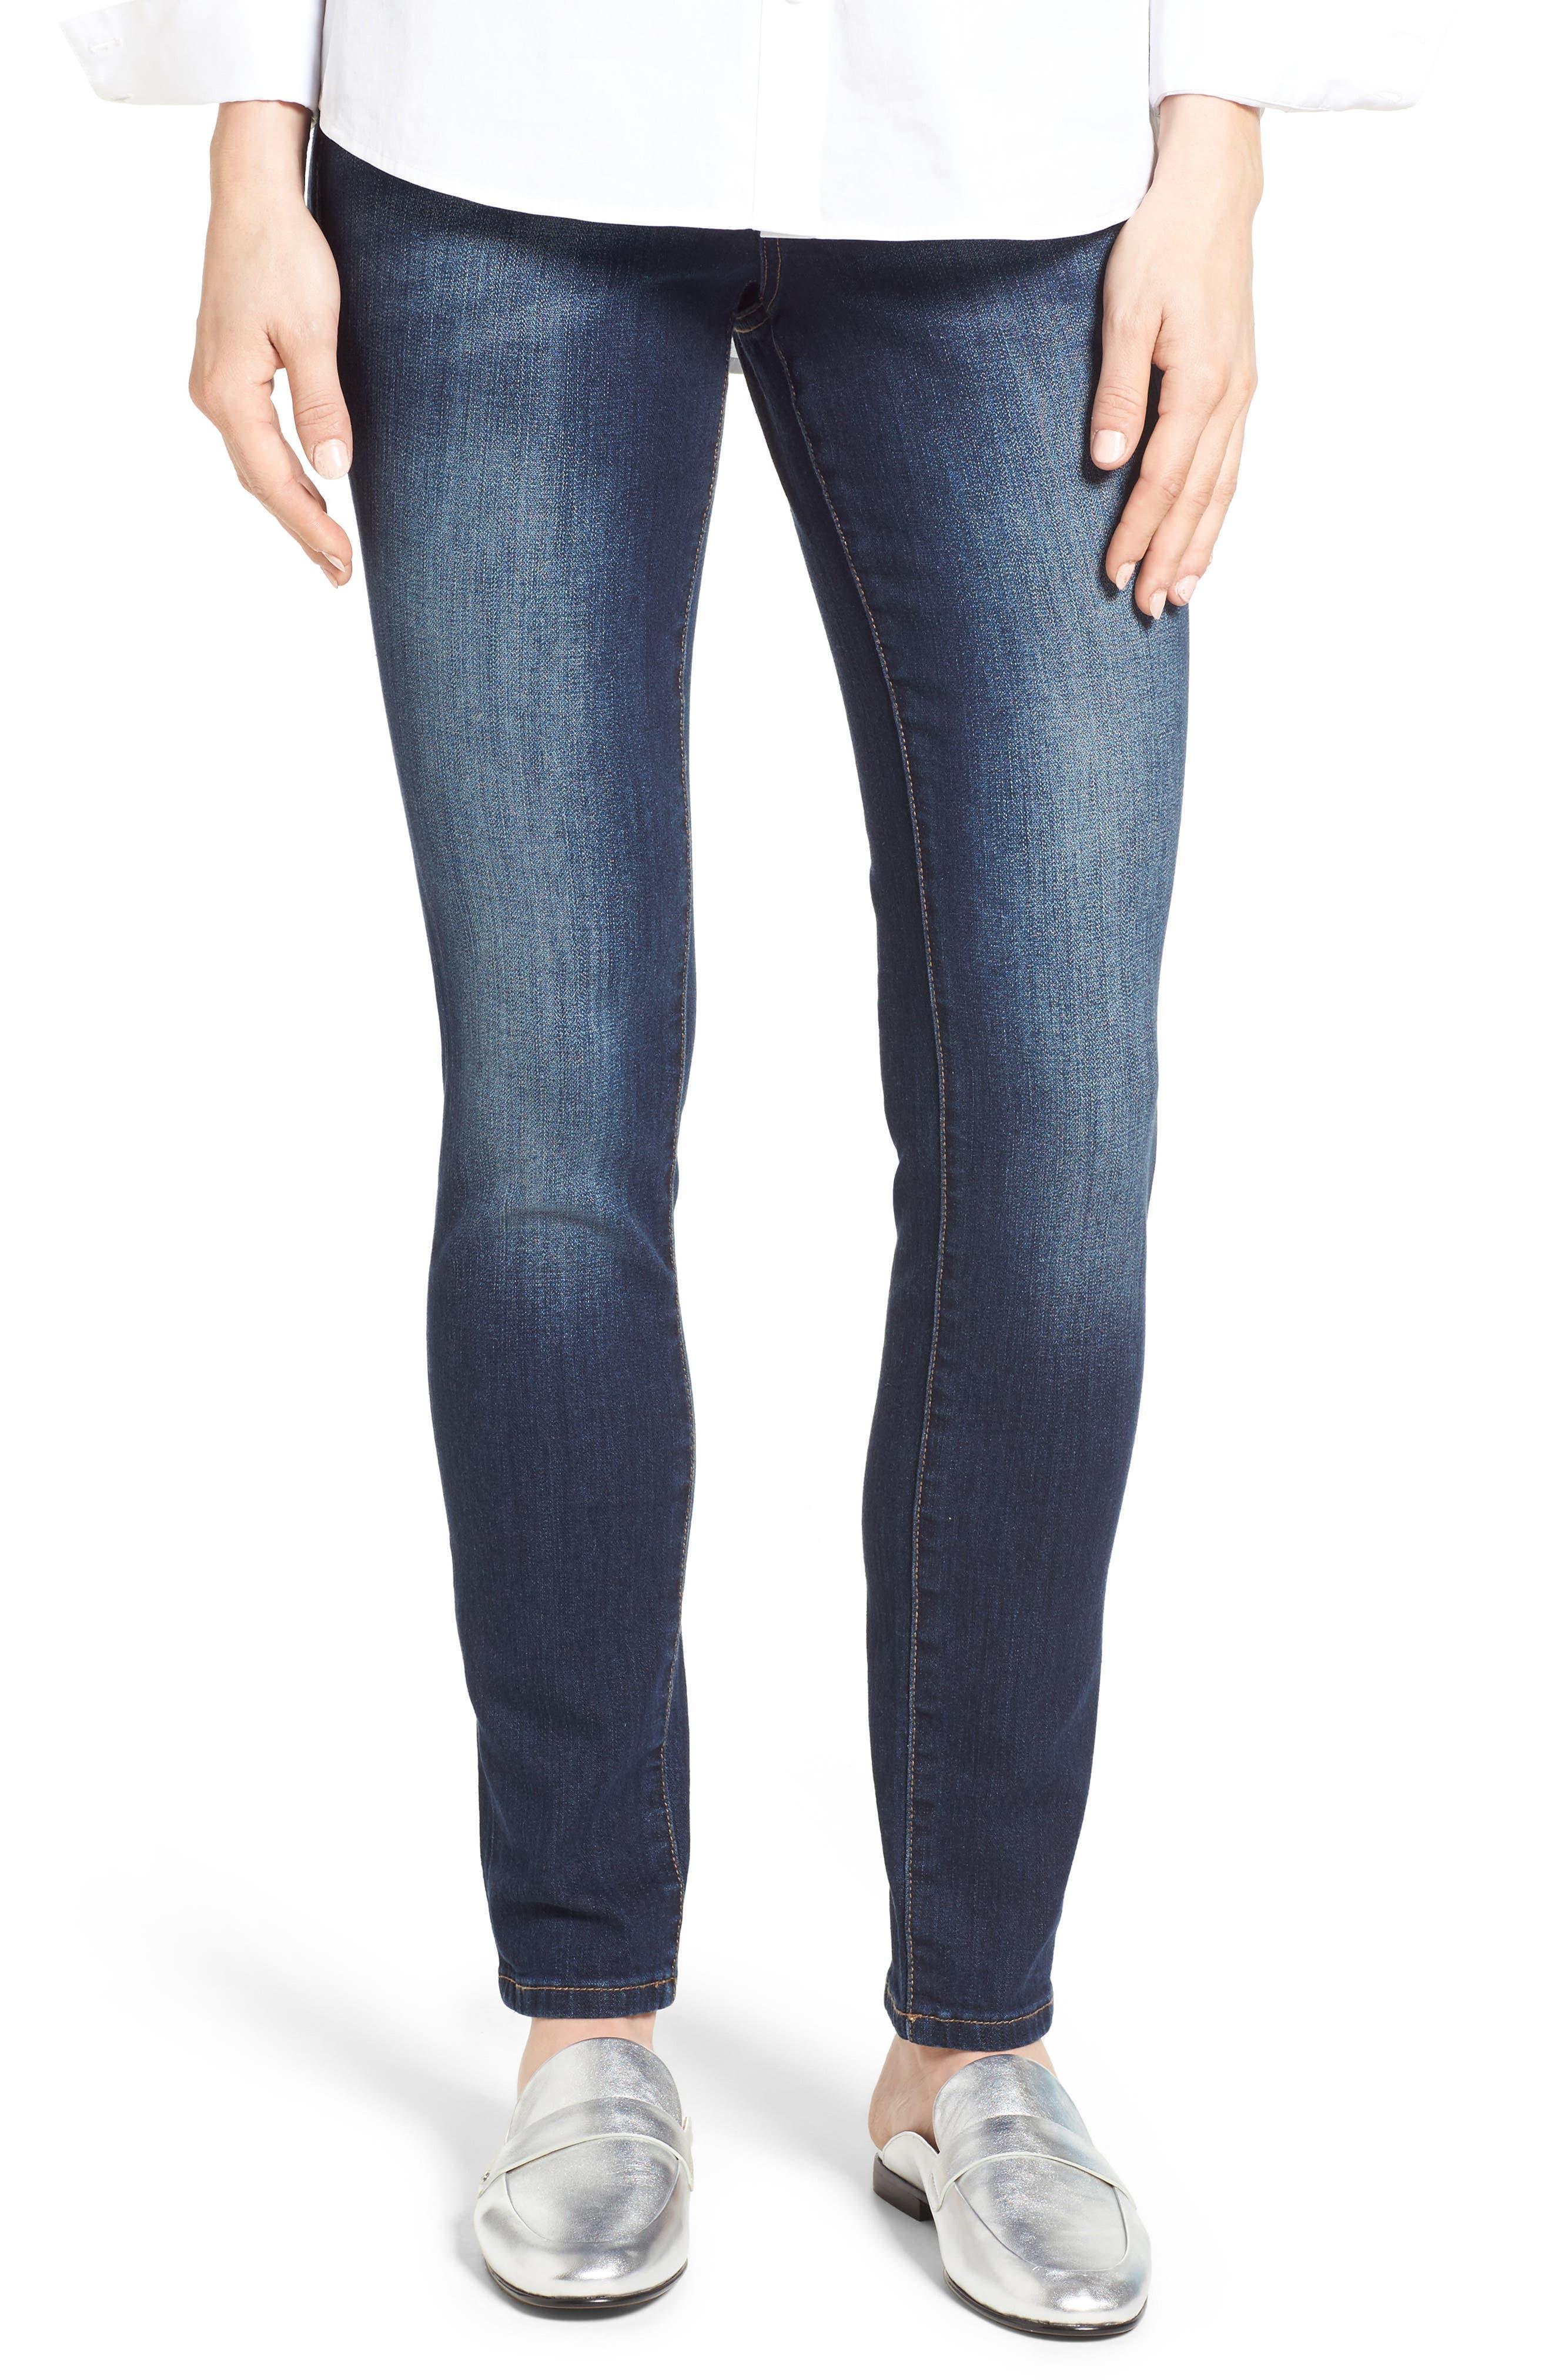 Main Image - Jag Nora Stretch Cotton Skinny Jeans (Medium Indigo)